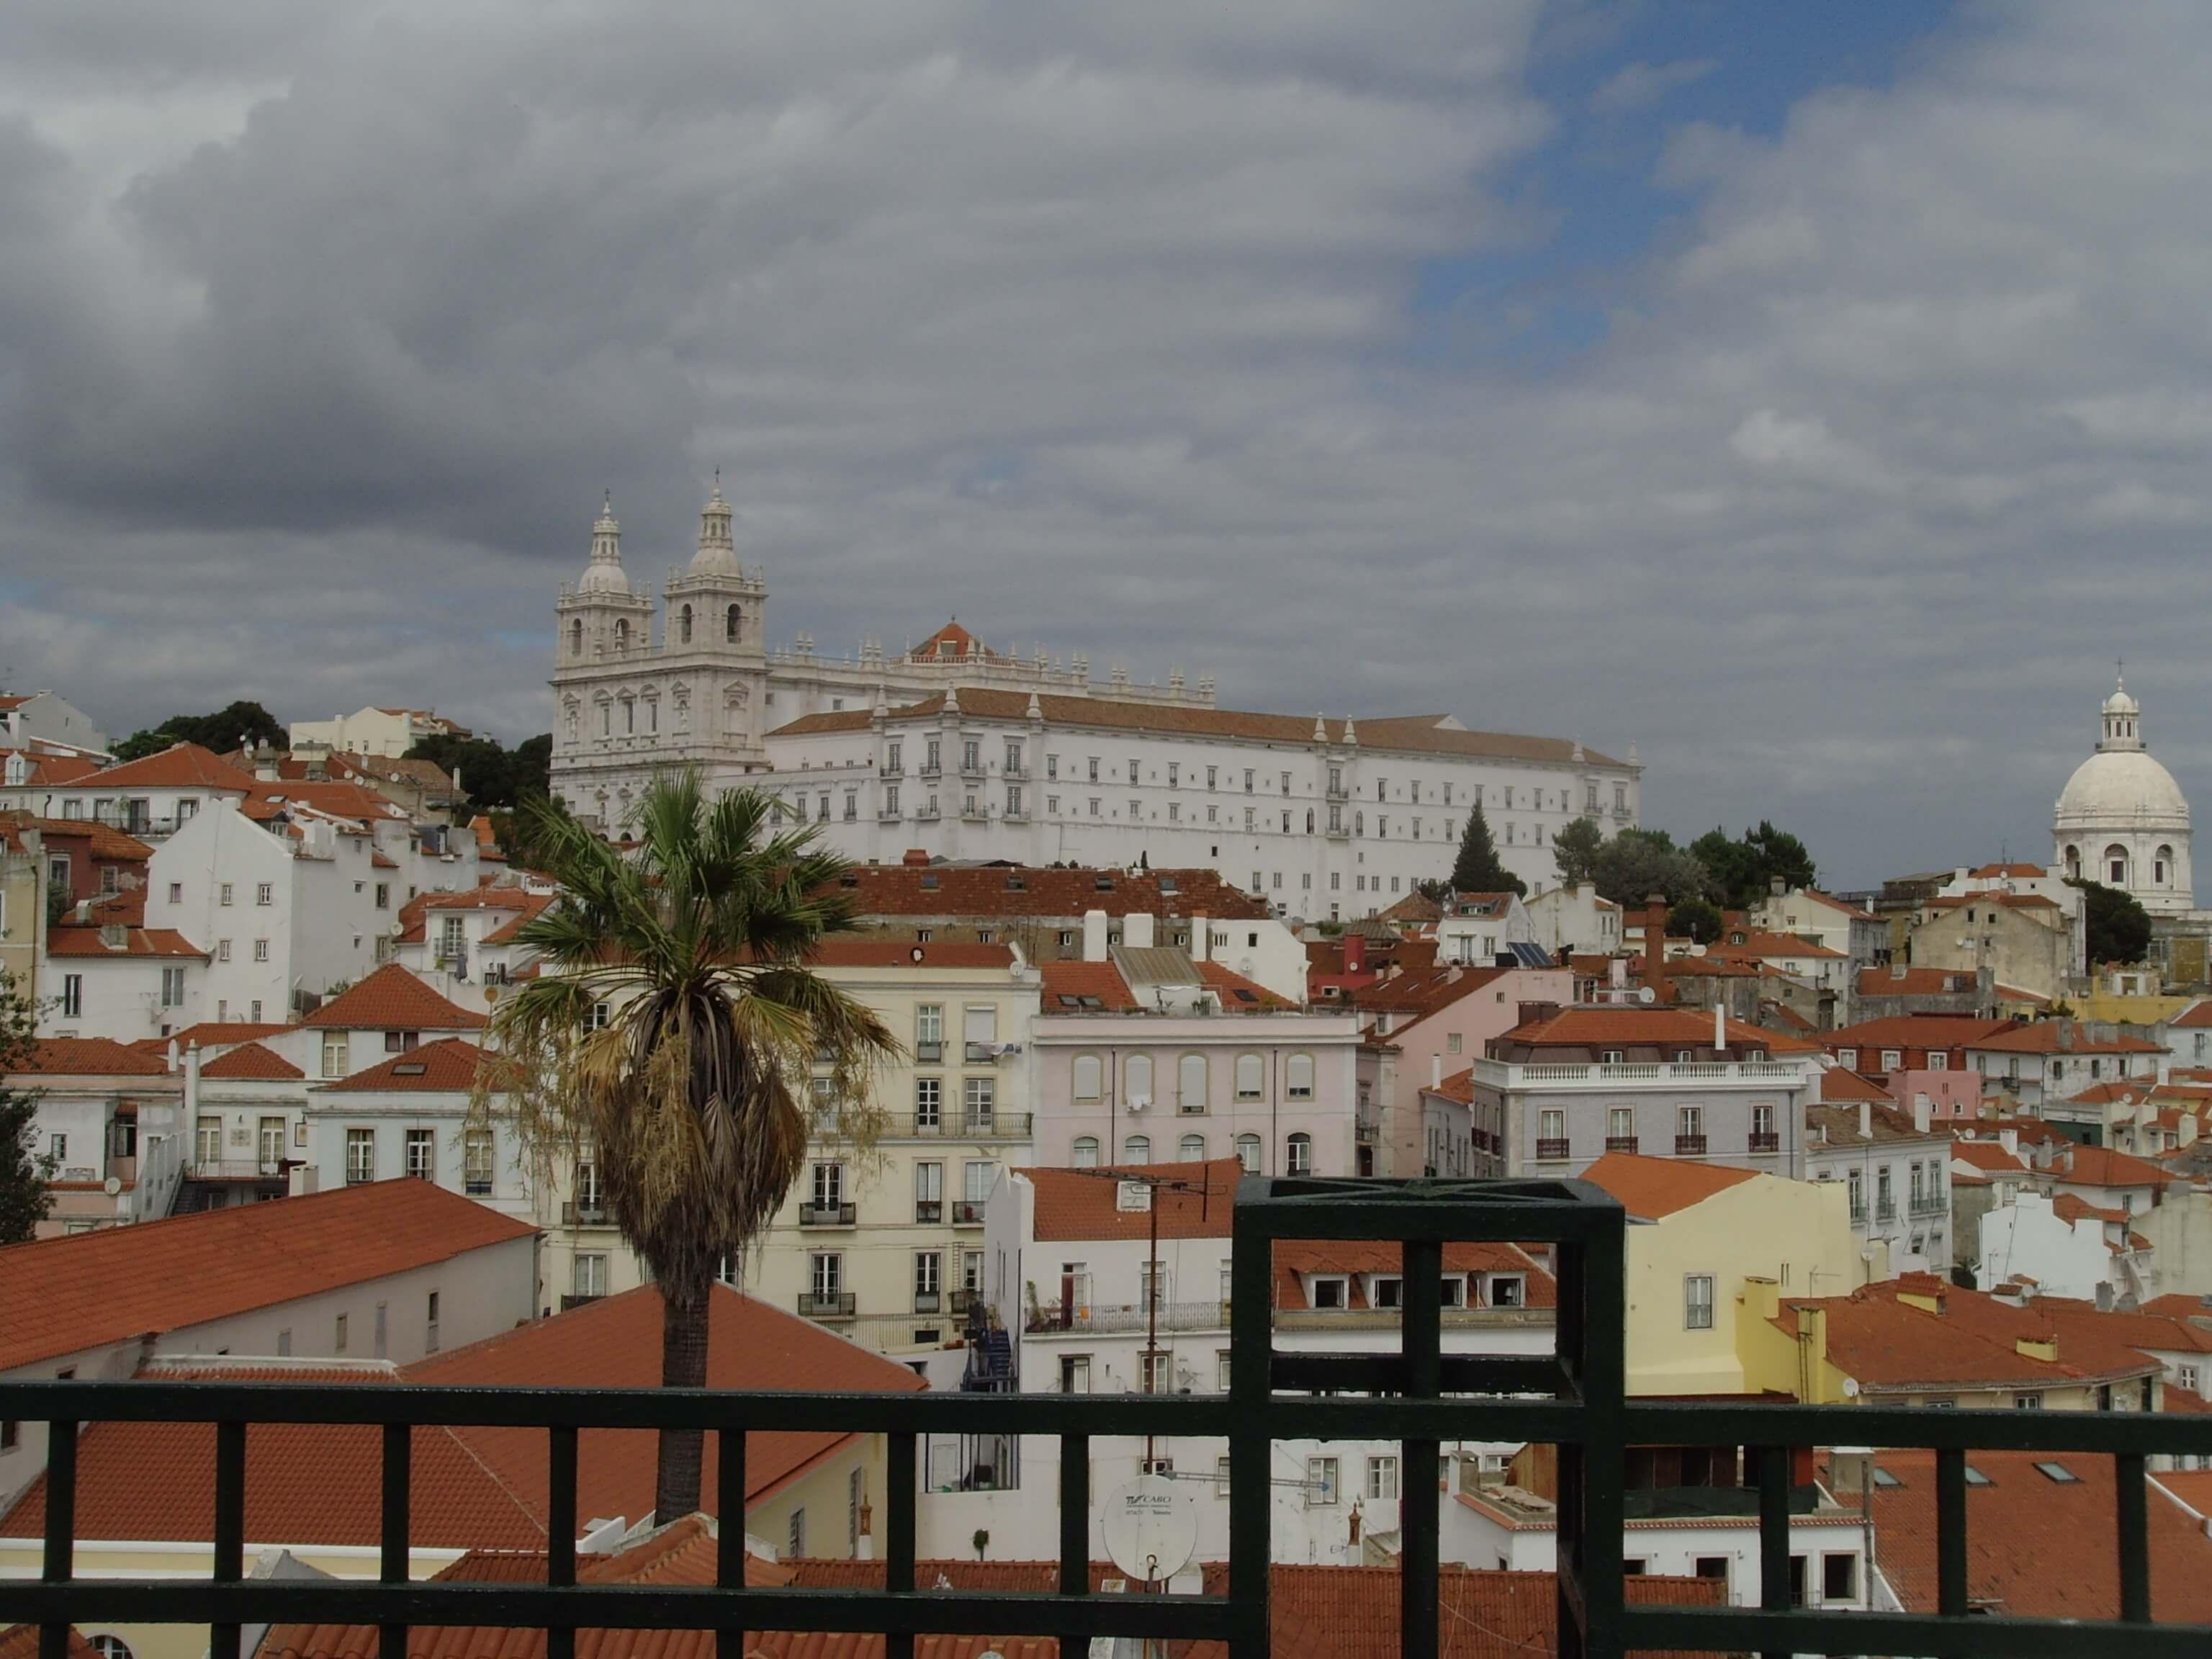 Rondreizen Portugal Lissabon klooster 2